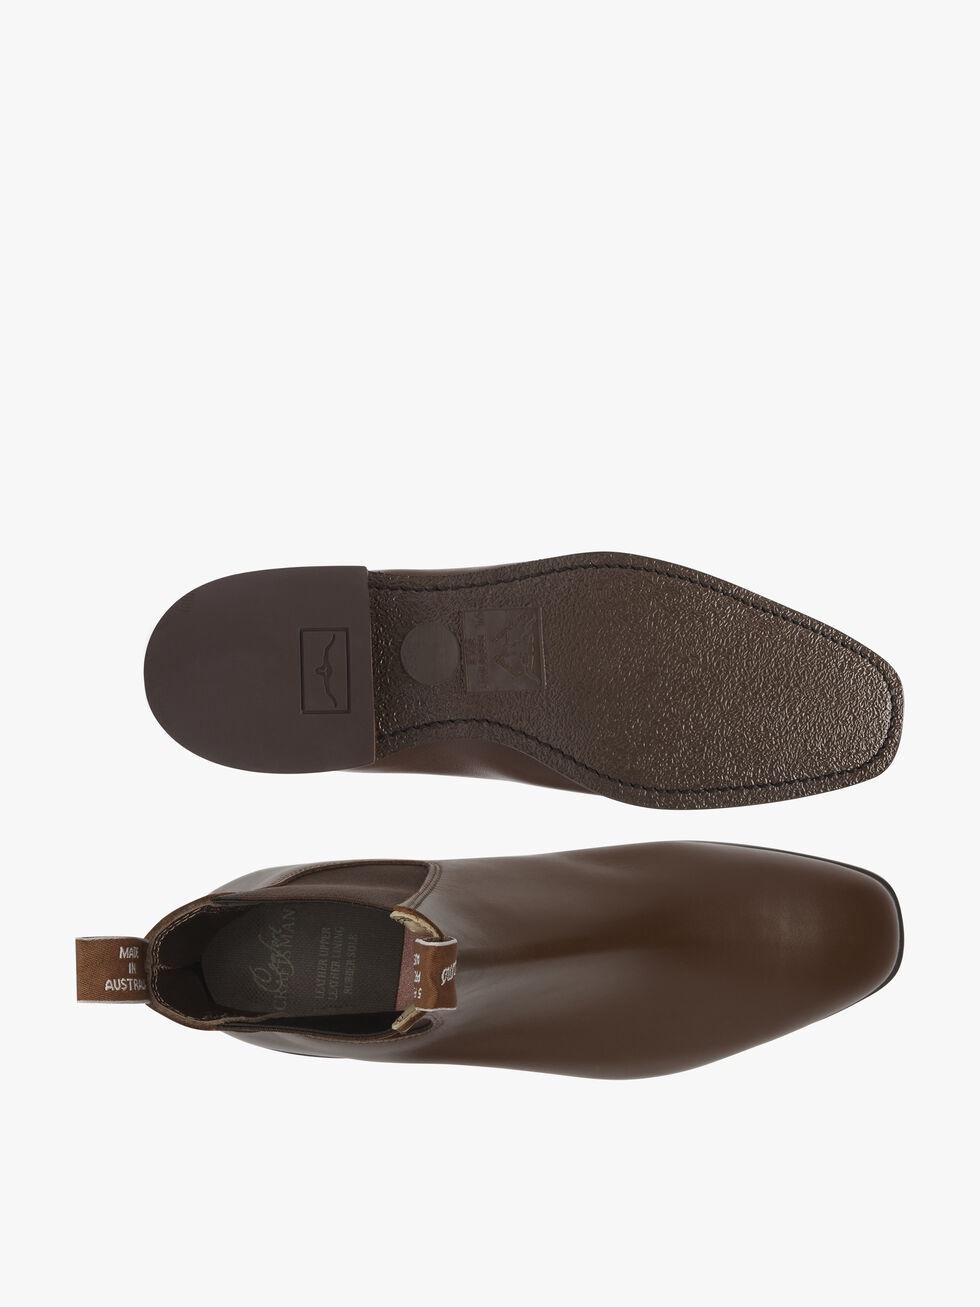 RM Williams Comfort Craftsman Boot – Dark Tan